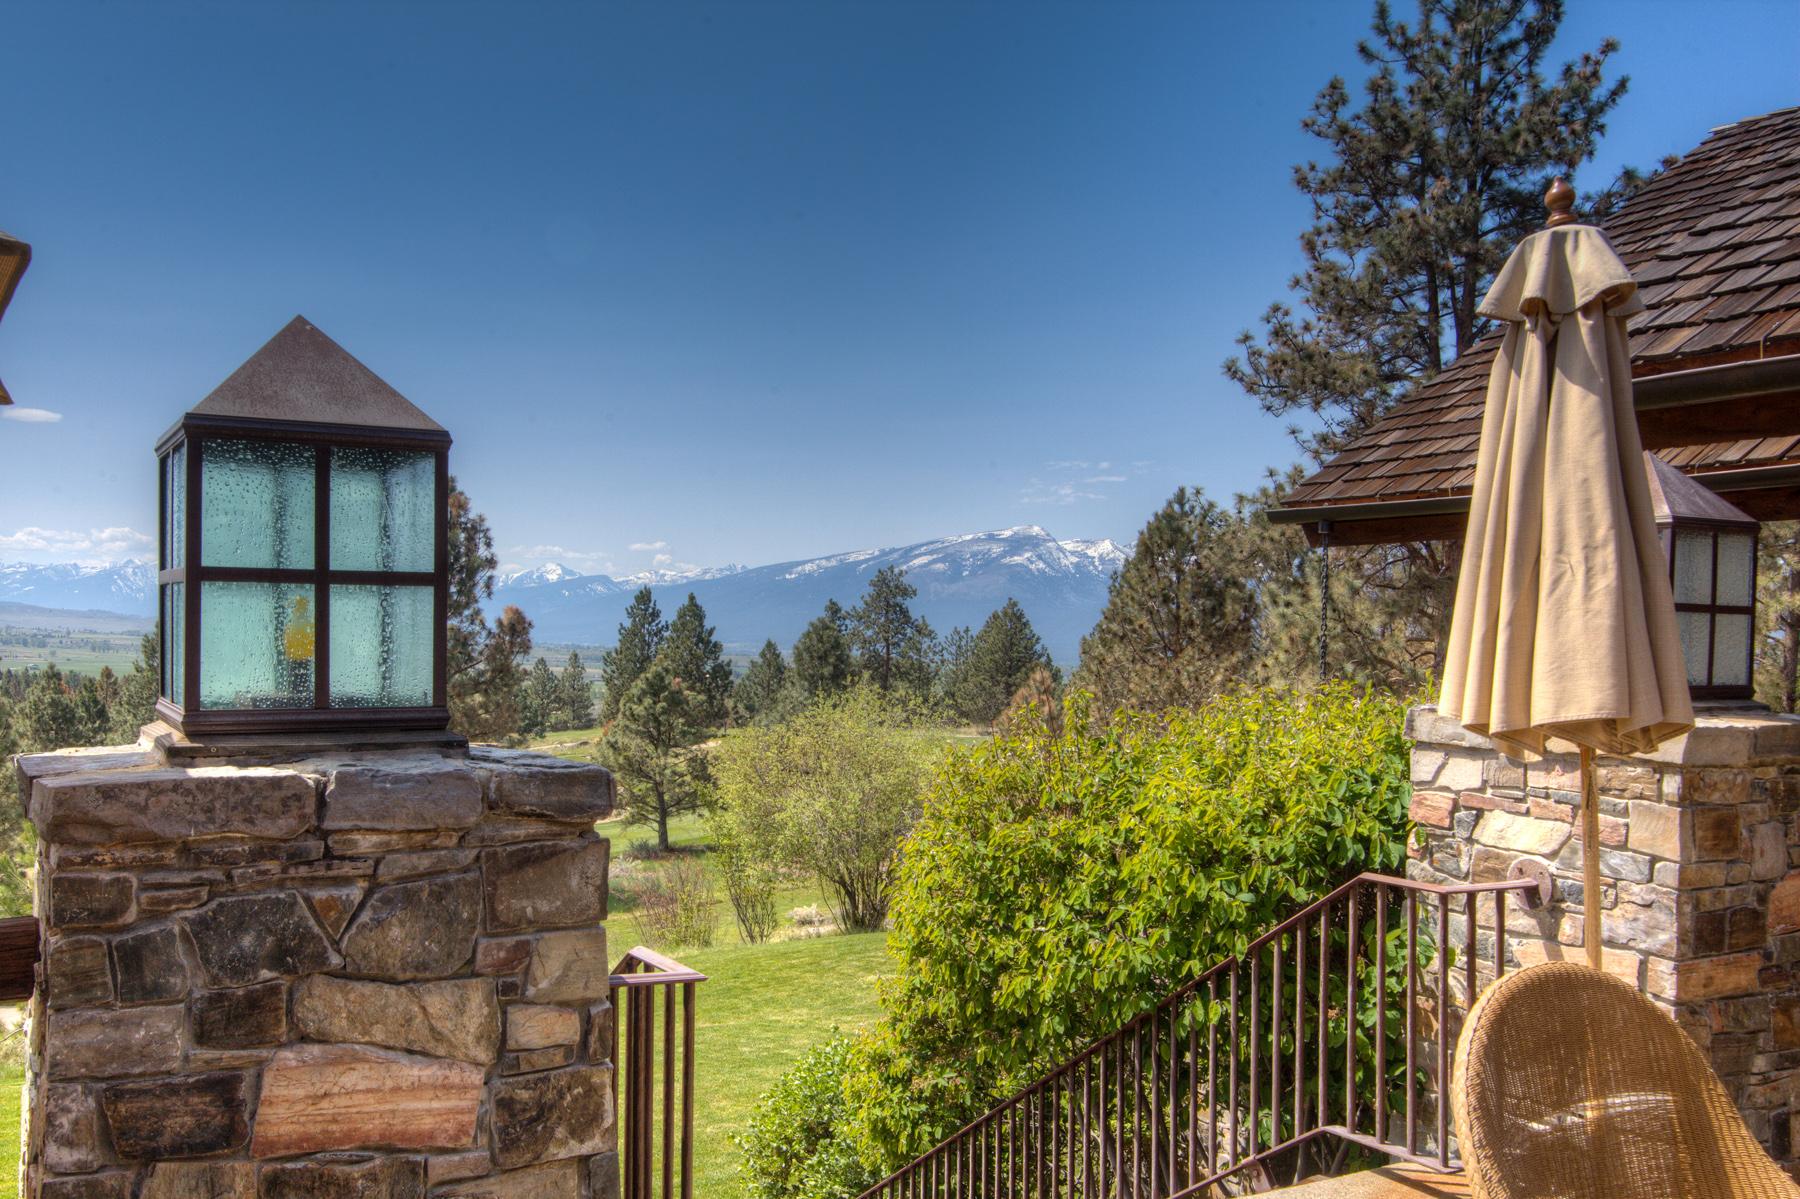 Land for Sale at Lot 52 Stock Farm Hamilton, Montana, 59840 United States